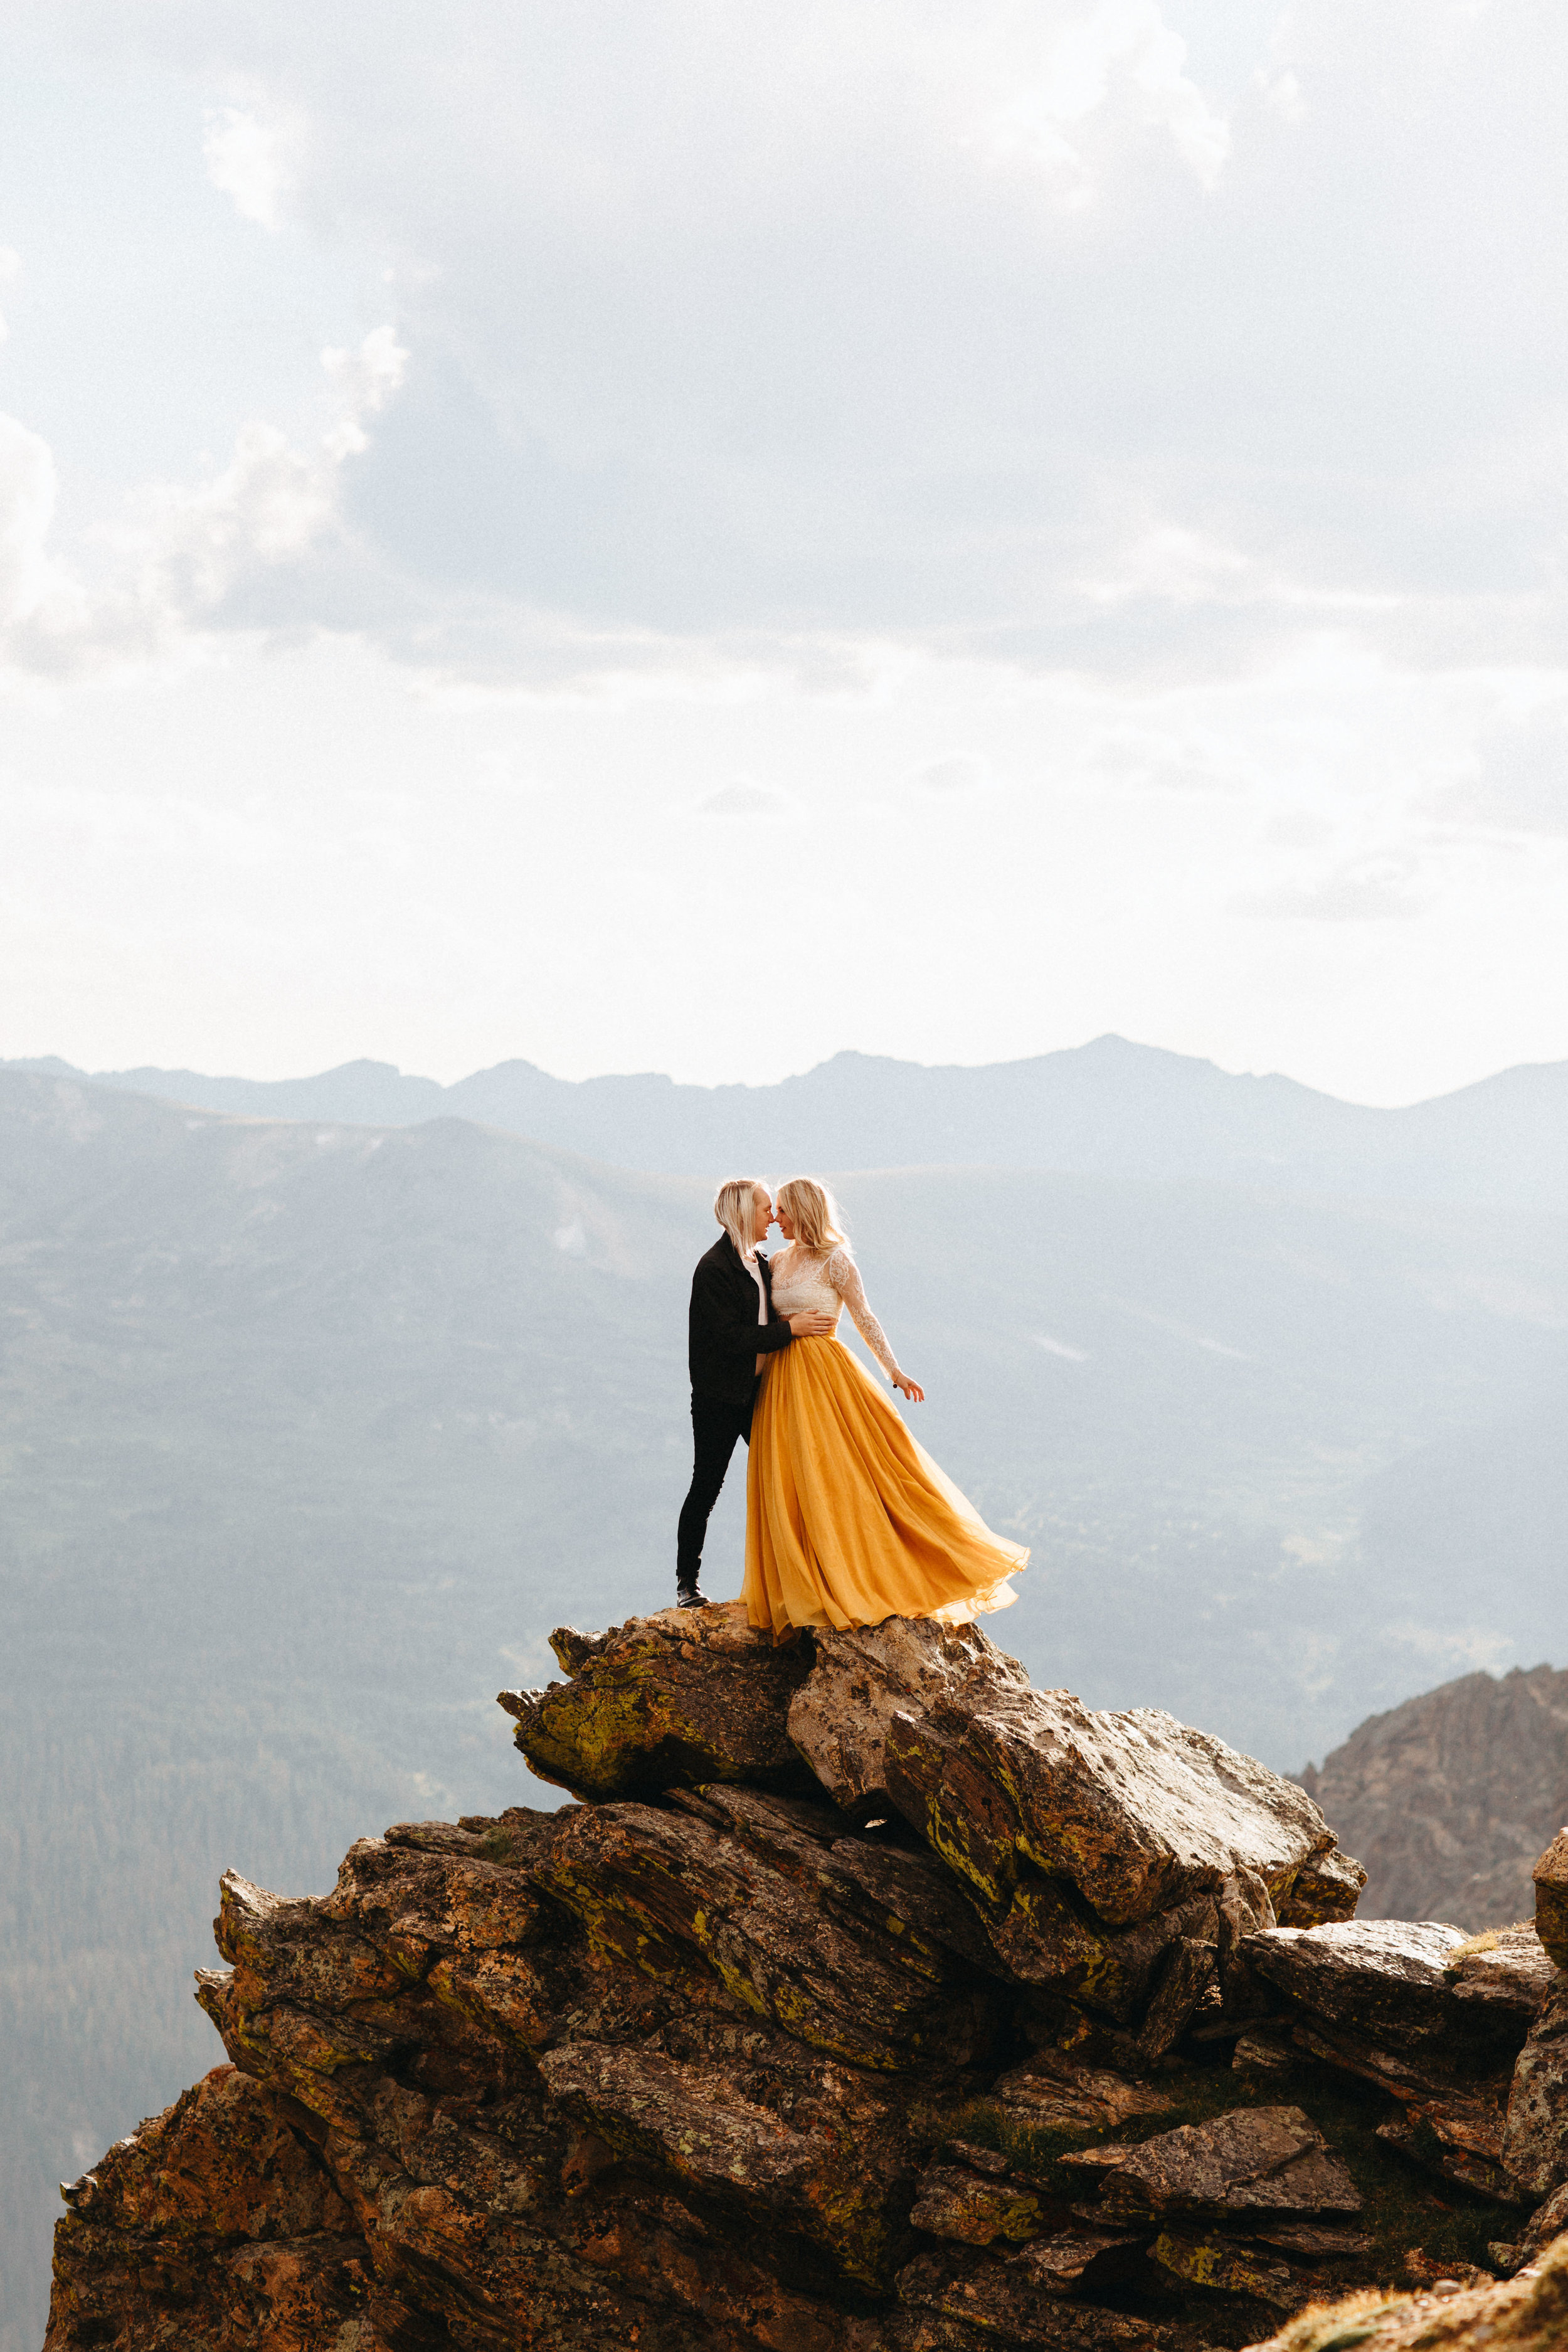 Liz Osban Photography Rocky Mountain National Park Trail Ridge Road Sweet Carolina Styles Skirt Marigold Yellow Cole Janzen Kelli Mantooth Mountains Colorado Northern Estes Park Alpine Elopement Wedding Destination Adventure LBGT Engaged31.jpg